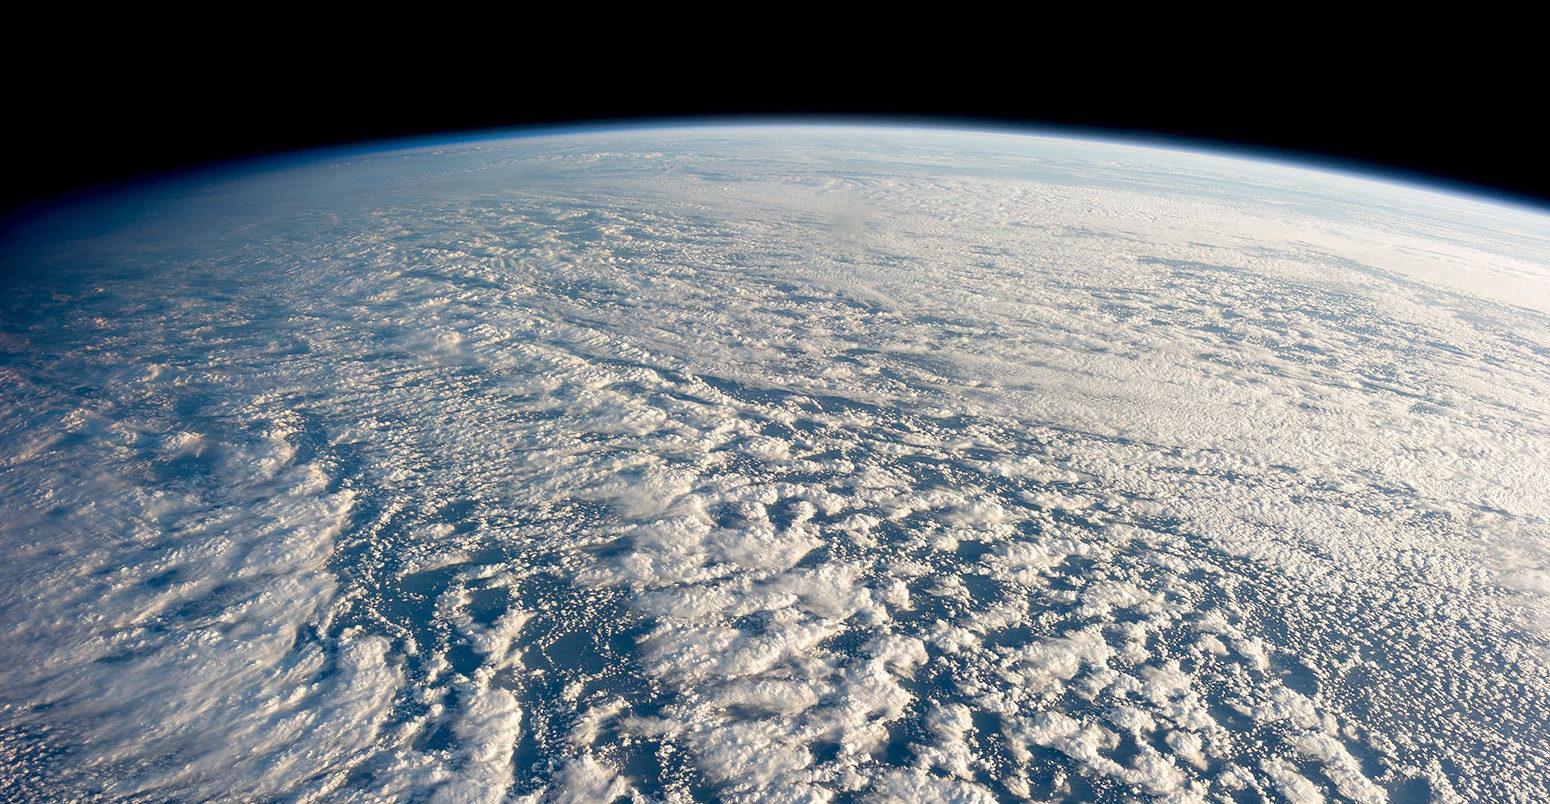 stratocumulus-Clouds-pacific-ocean-1550x804